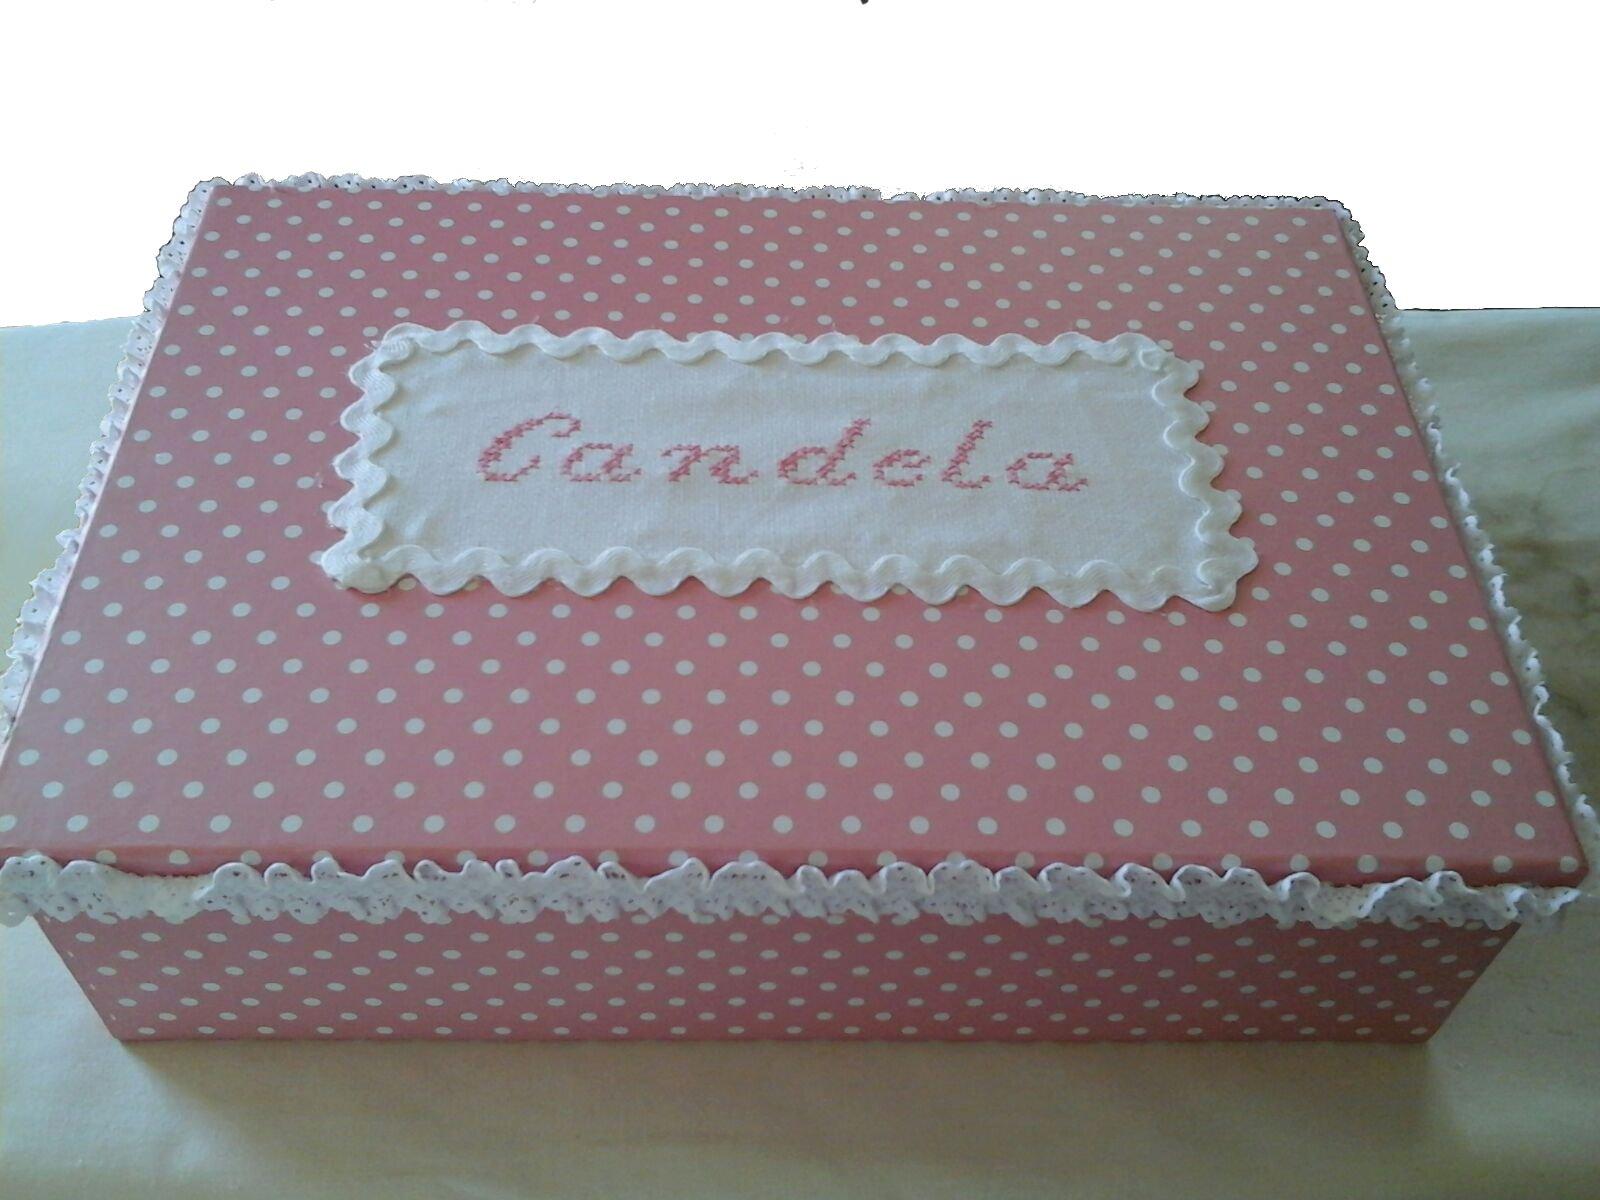 Cajas decoradas para bebes la caja para bebs finlandesa - Cajas de carton decoradas para bebes ...